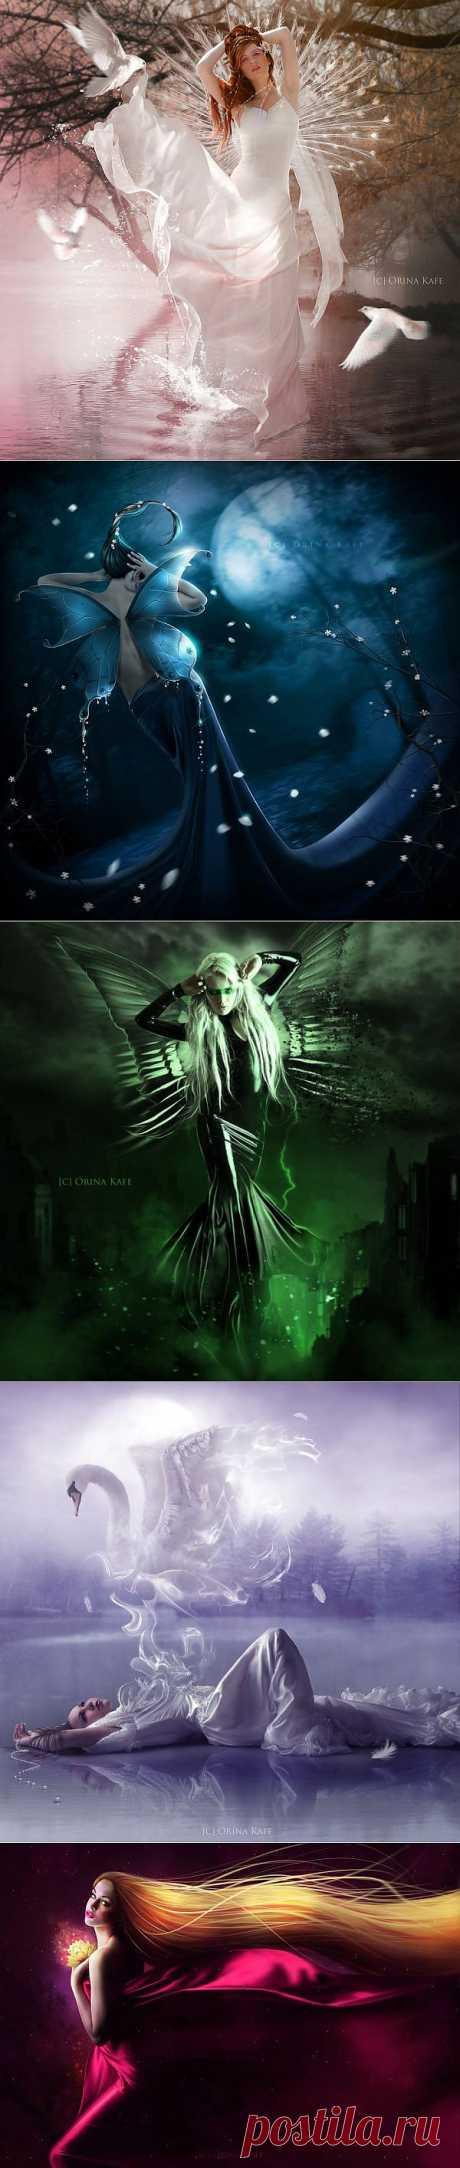 Fantasy art by Orina Kafe » Фэнтези, фантастика, игры.